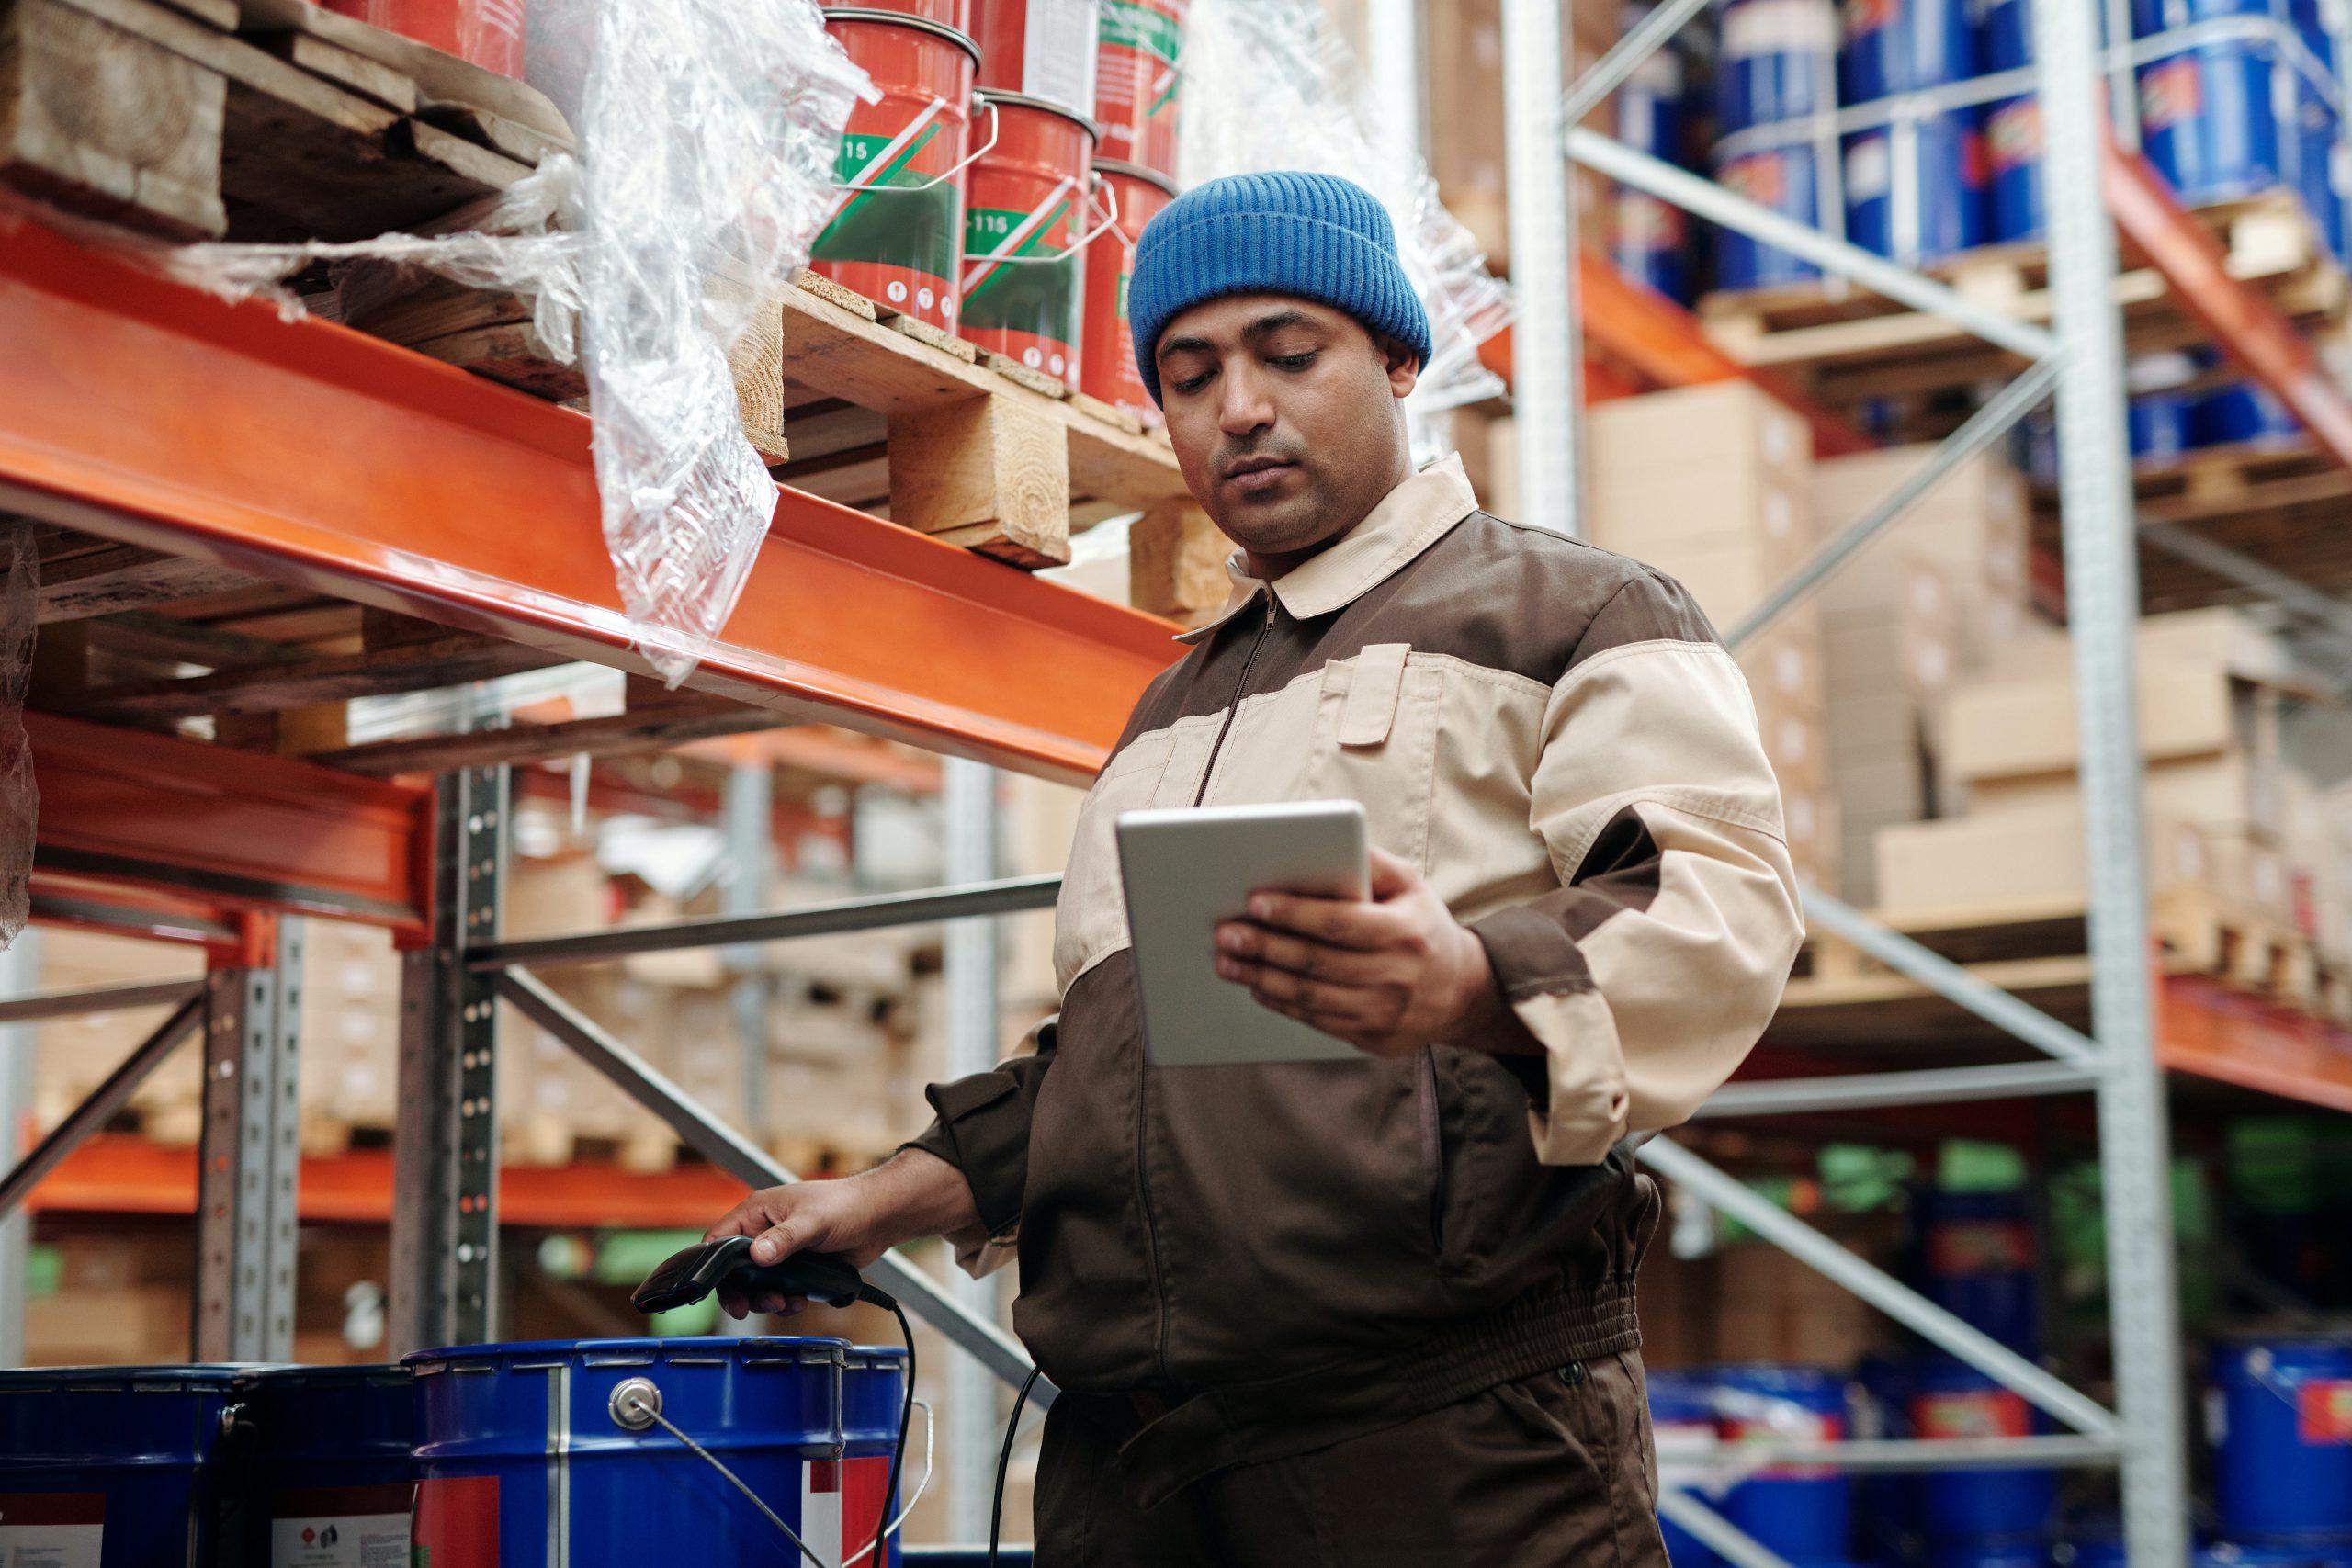 Worker using scanner in an industry